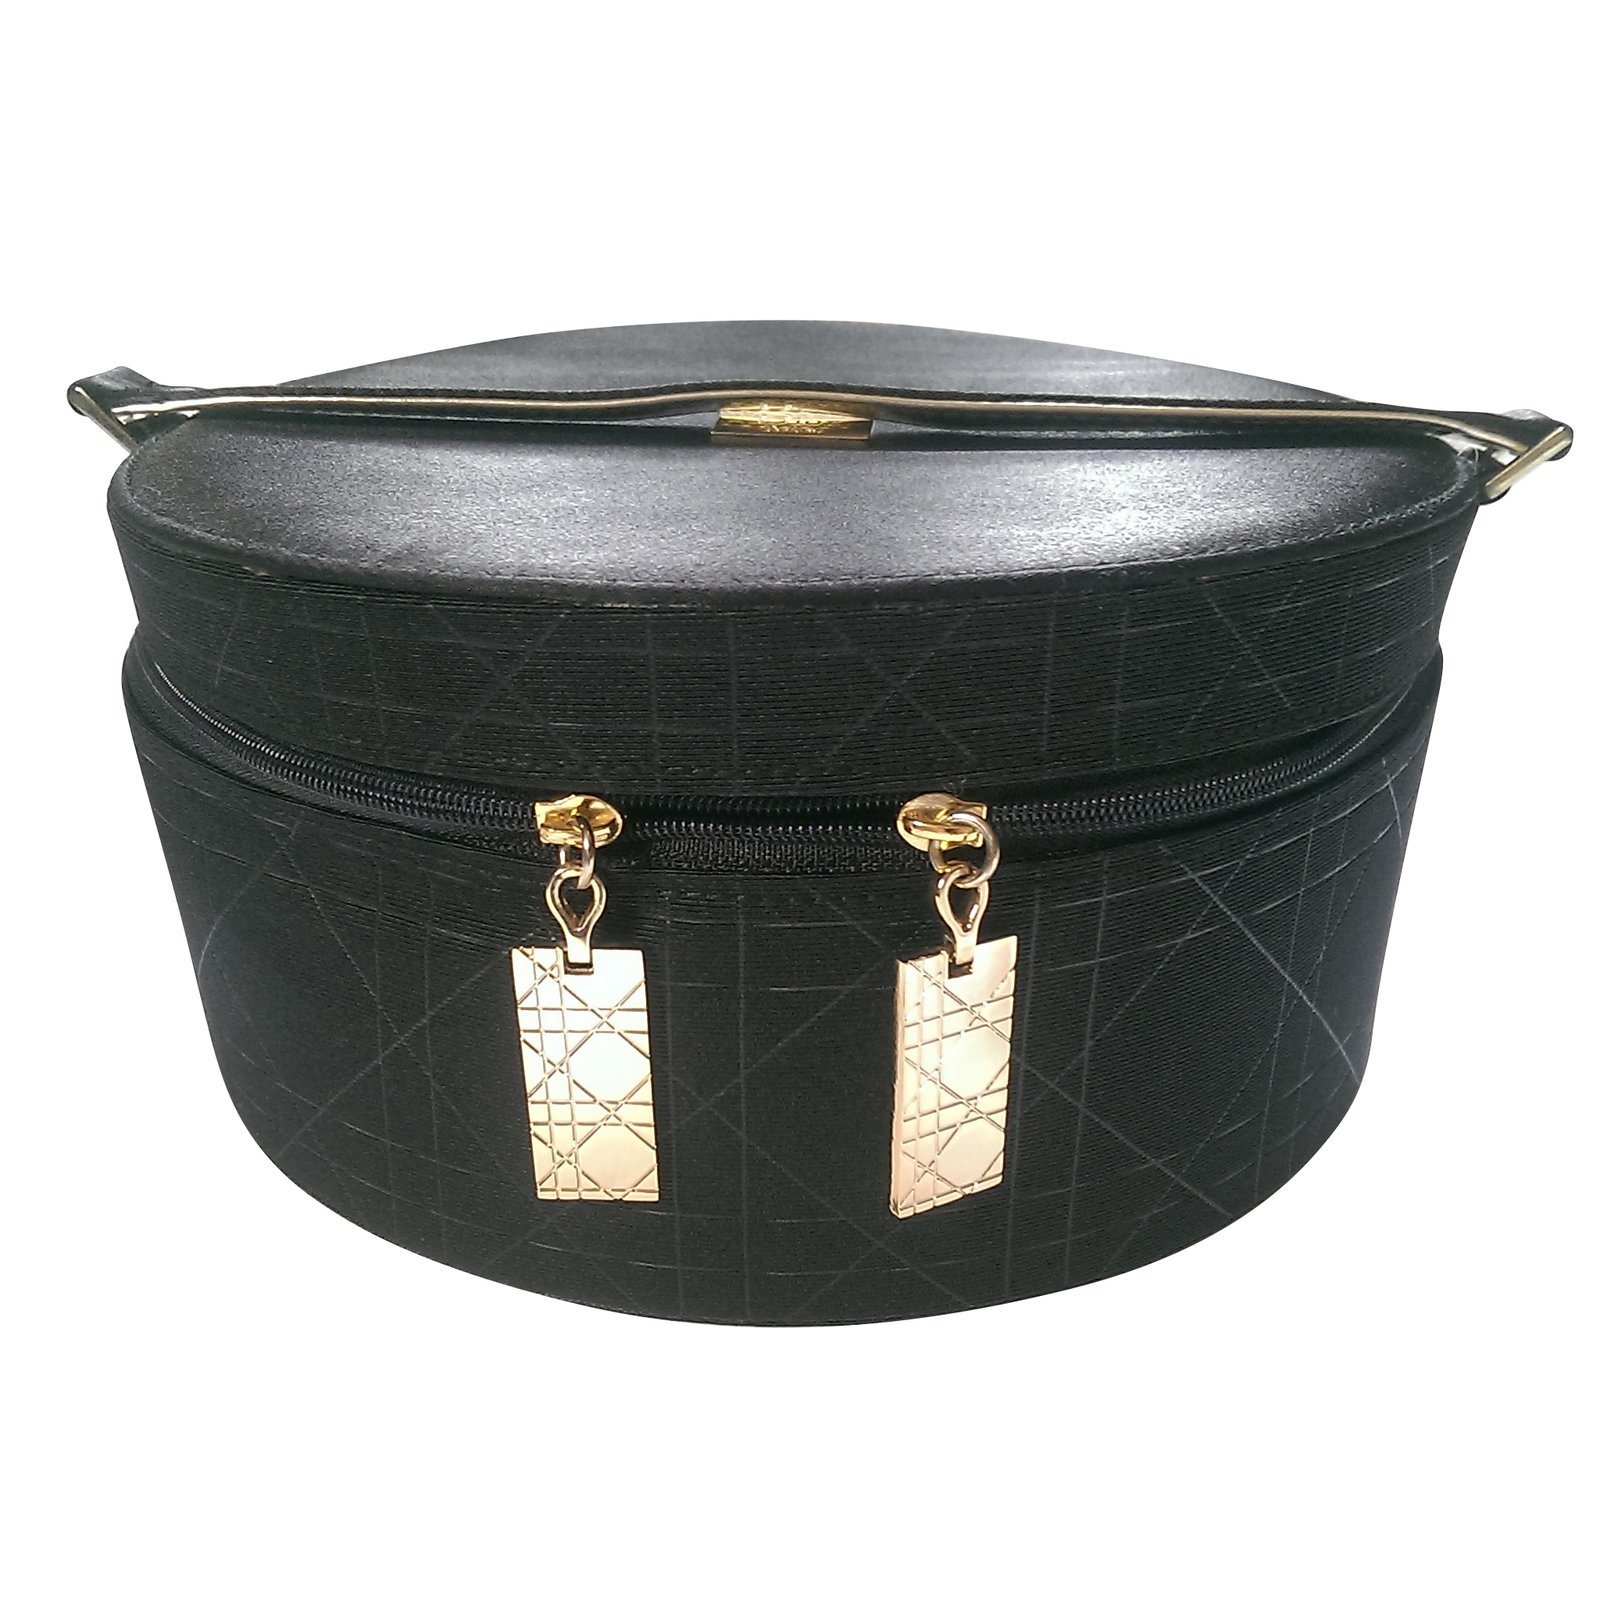 Dior Round Jewelry Box Purses Wallets Cases Cloth Satin Black Ref